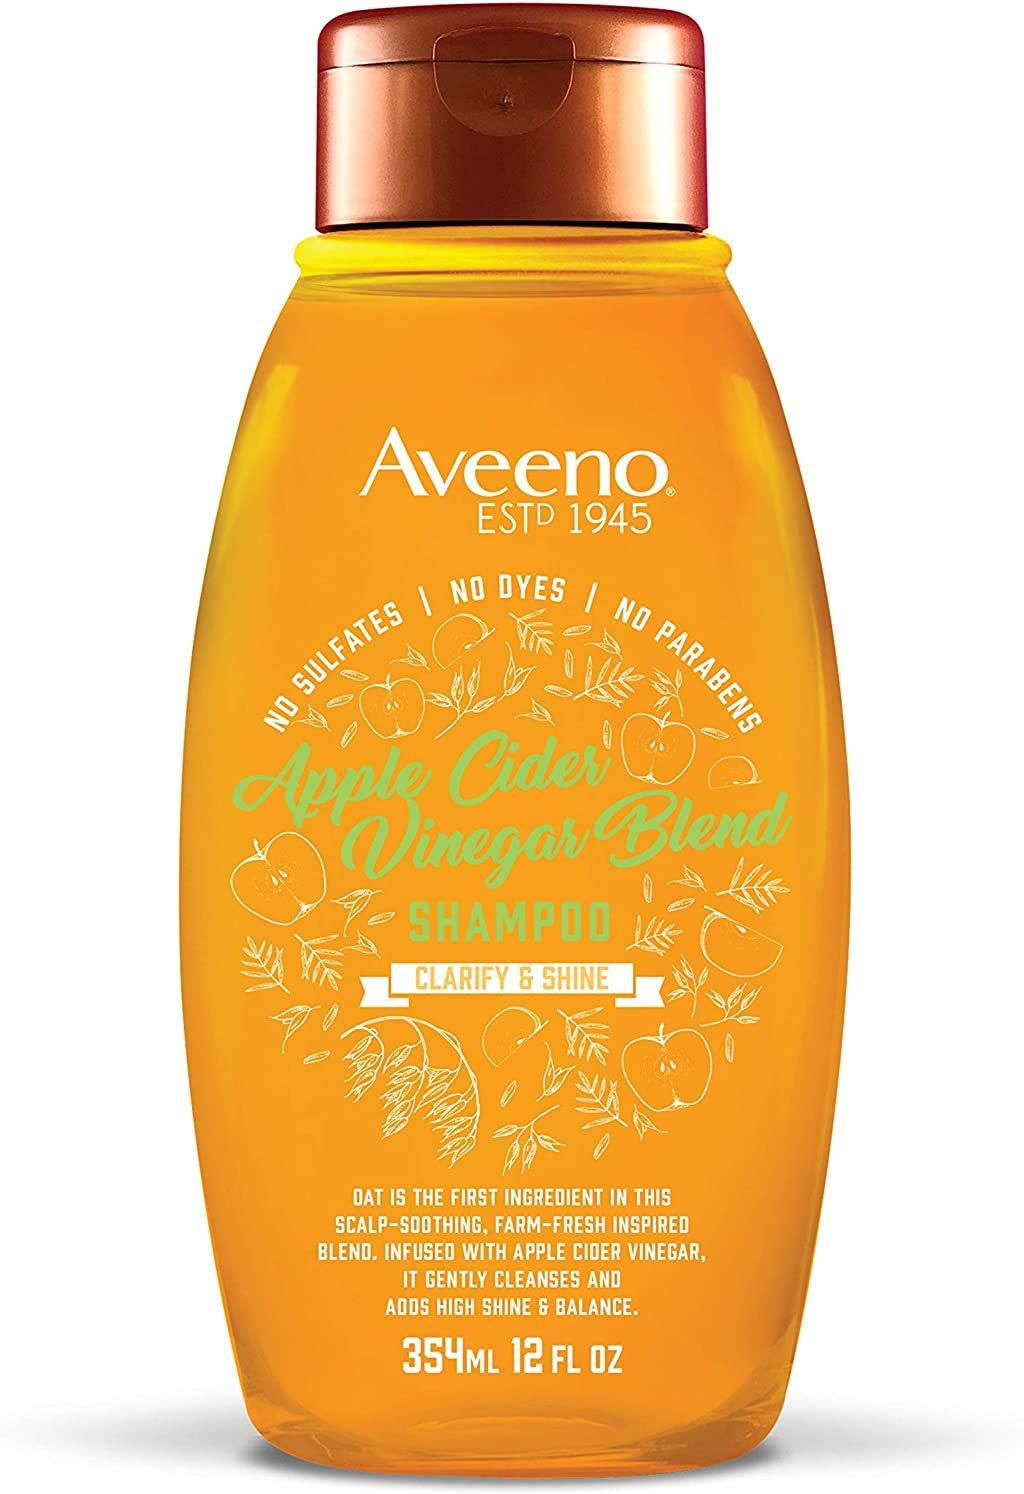 Aveeno Scalp Soothing Shampoo, Apple Cider Vinegar Blend 12 Fl Oz